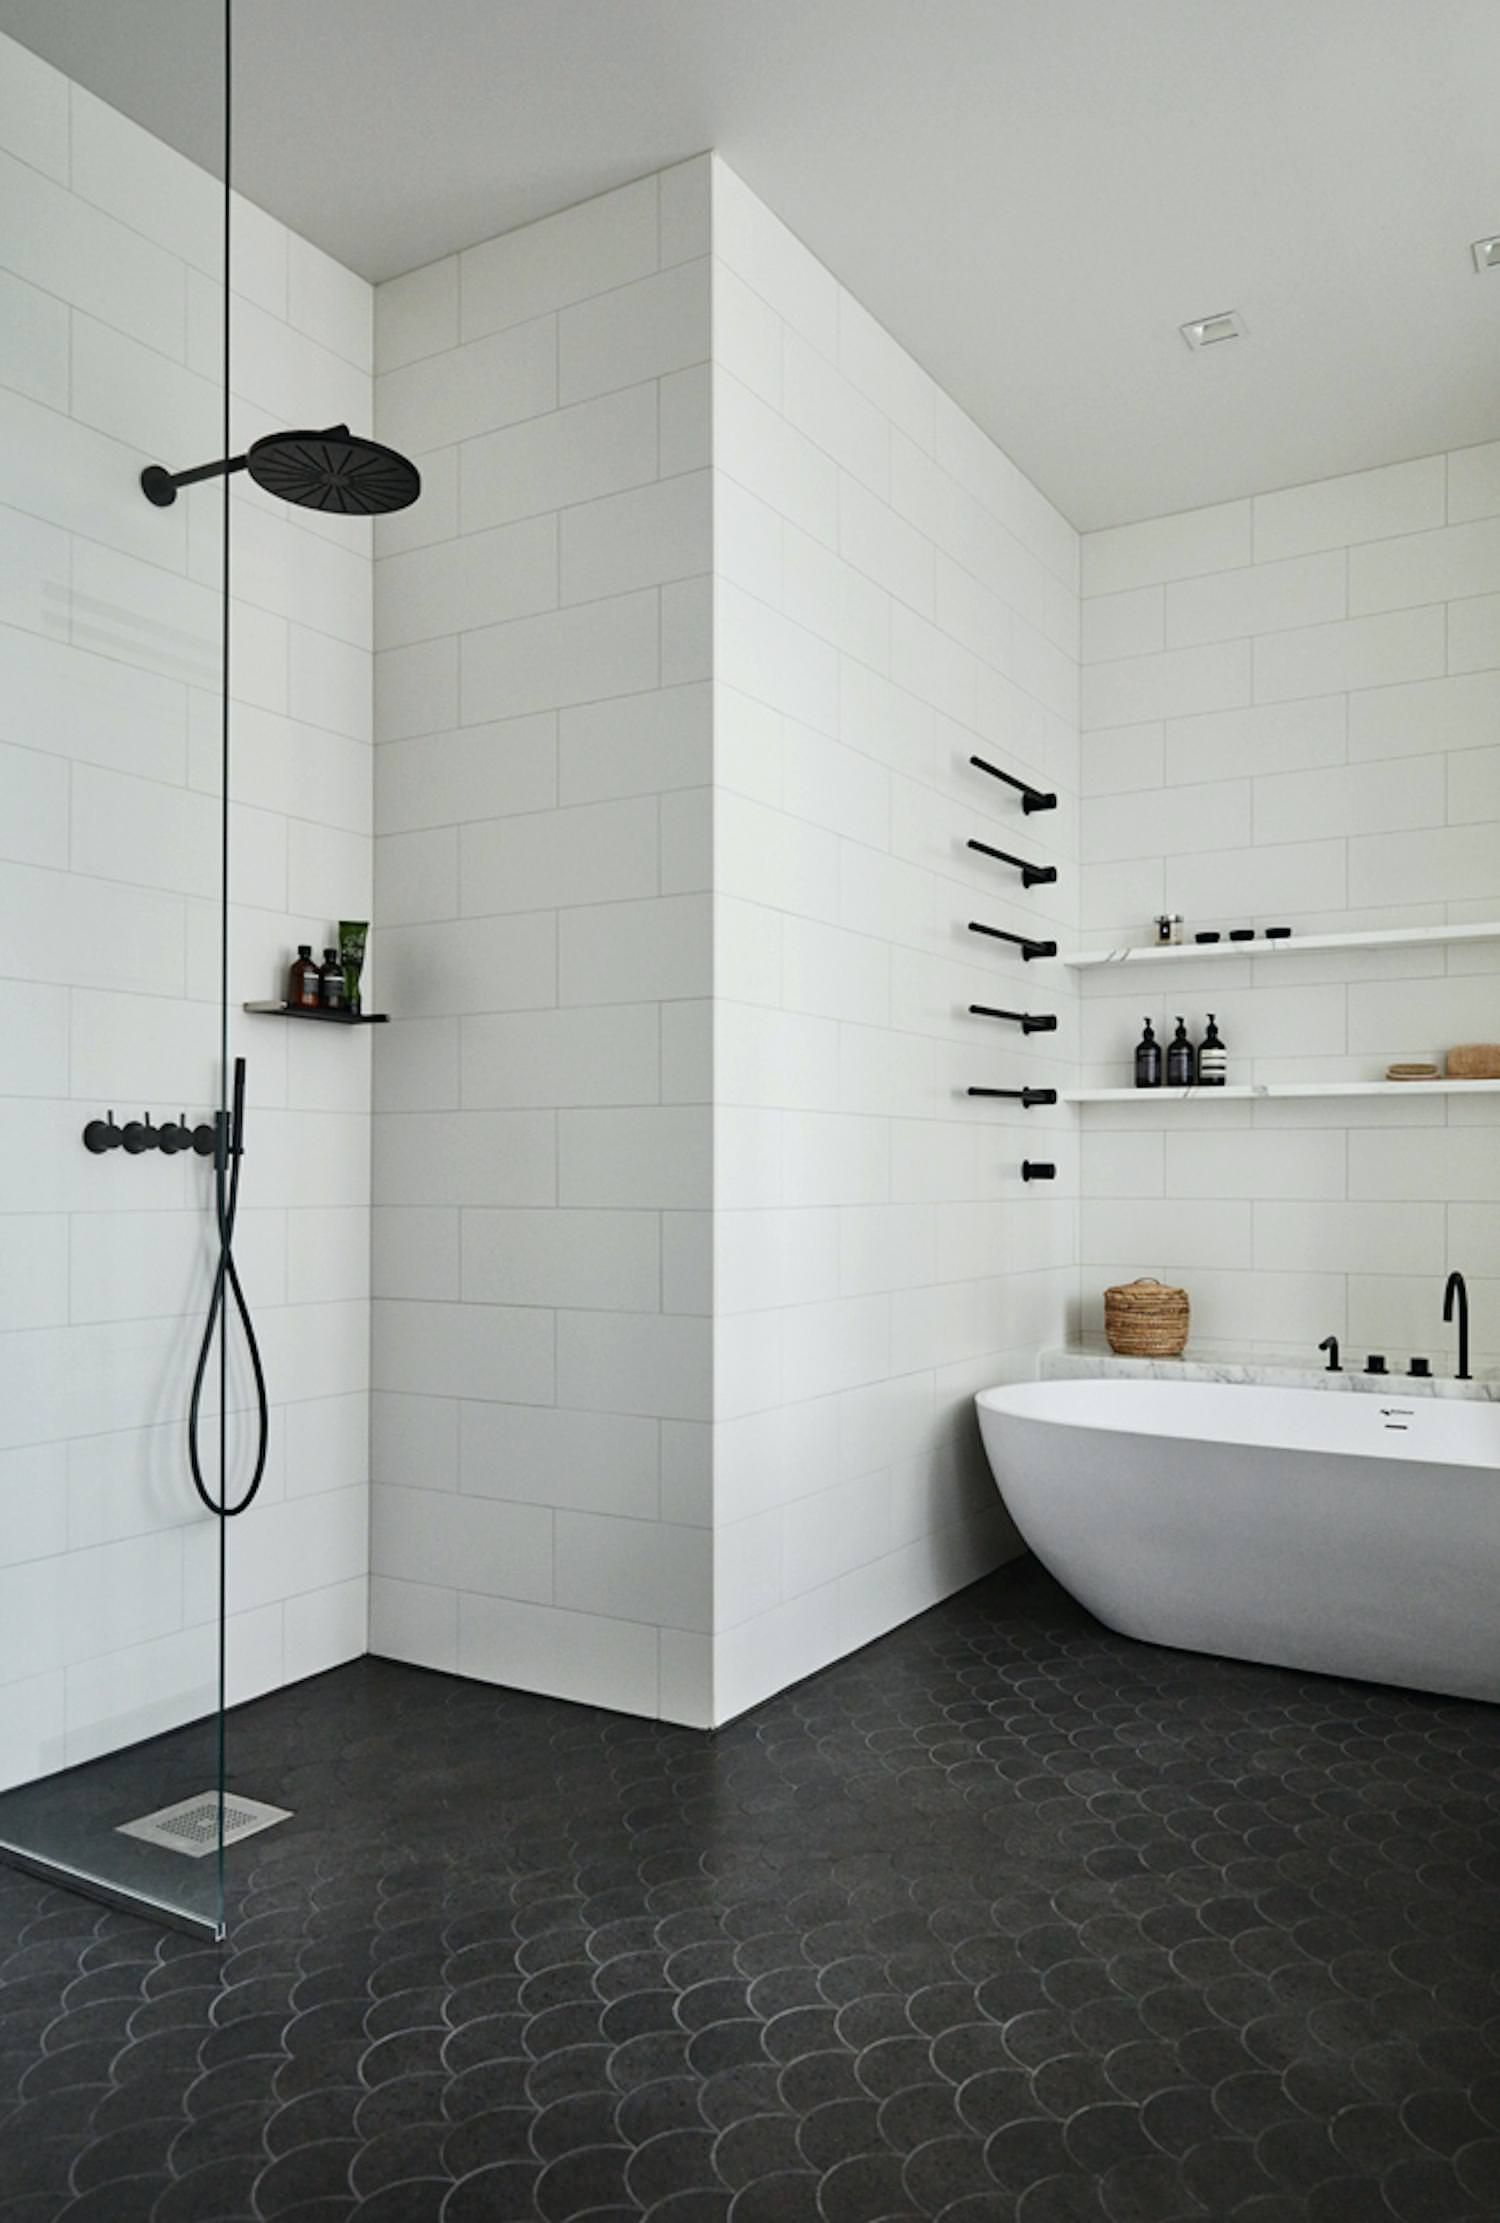 2018 Design Trends For The Bathroom Bathroom Trends Bathroom